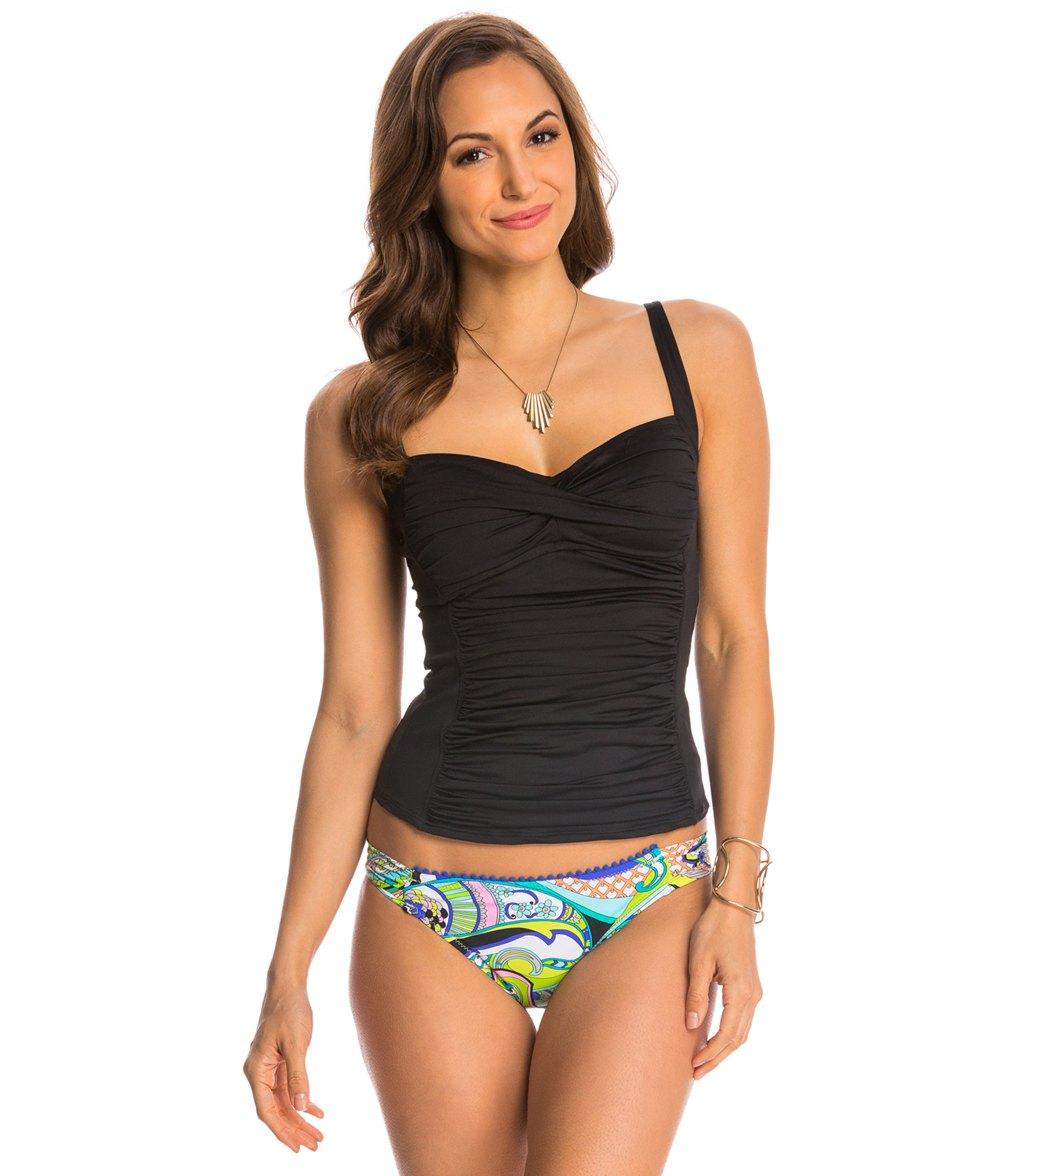 a60e36222d1d0 La Blanca Island Goddess Sweetheart Tankini Top at SwimOutlet.com - Free  Shipping